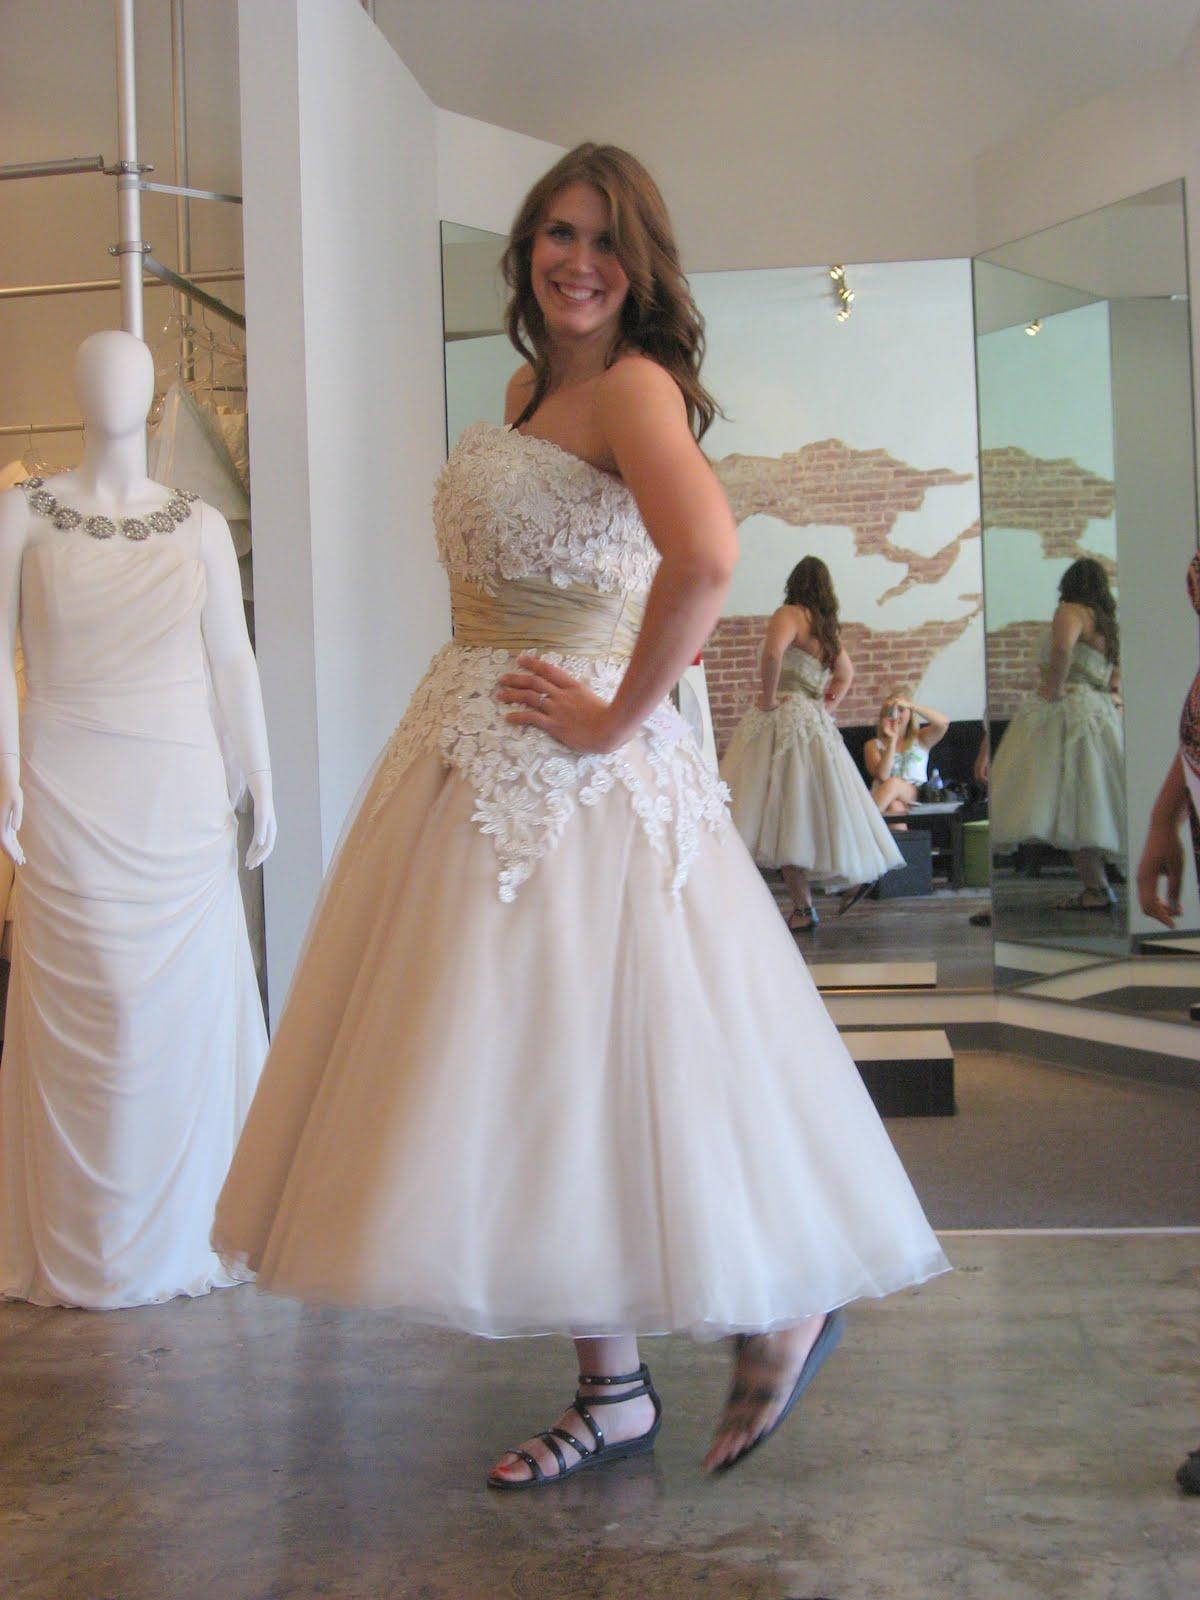 Wedding Dress Shopping 71 Inspirational My friend Kari came